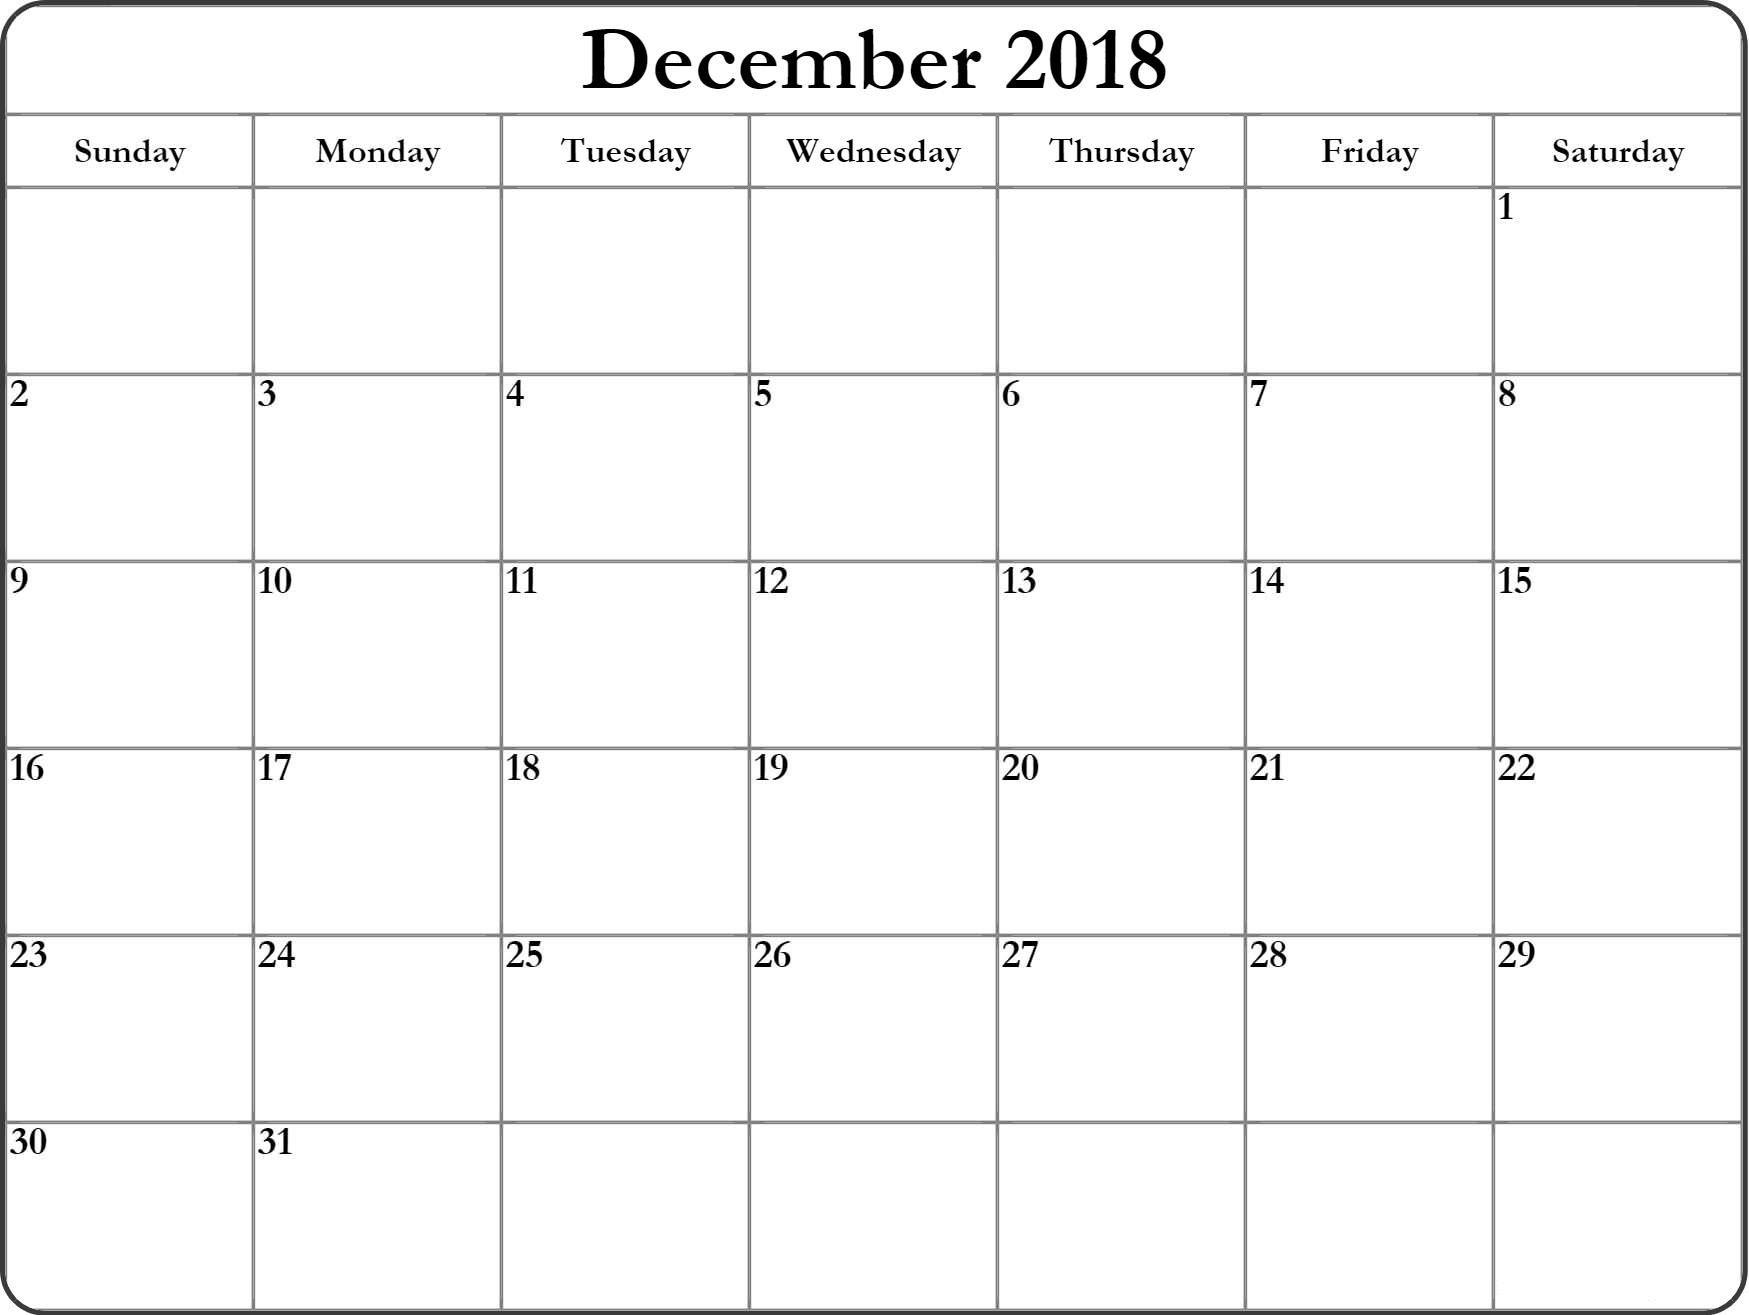 December 2018 Blank Landscape Calendar